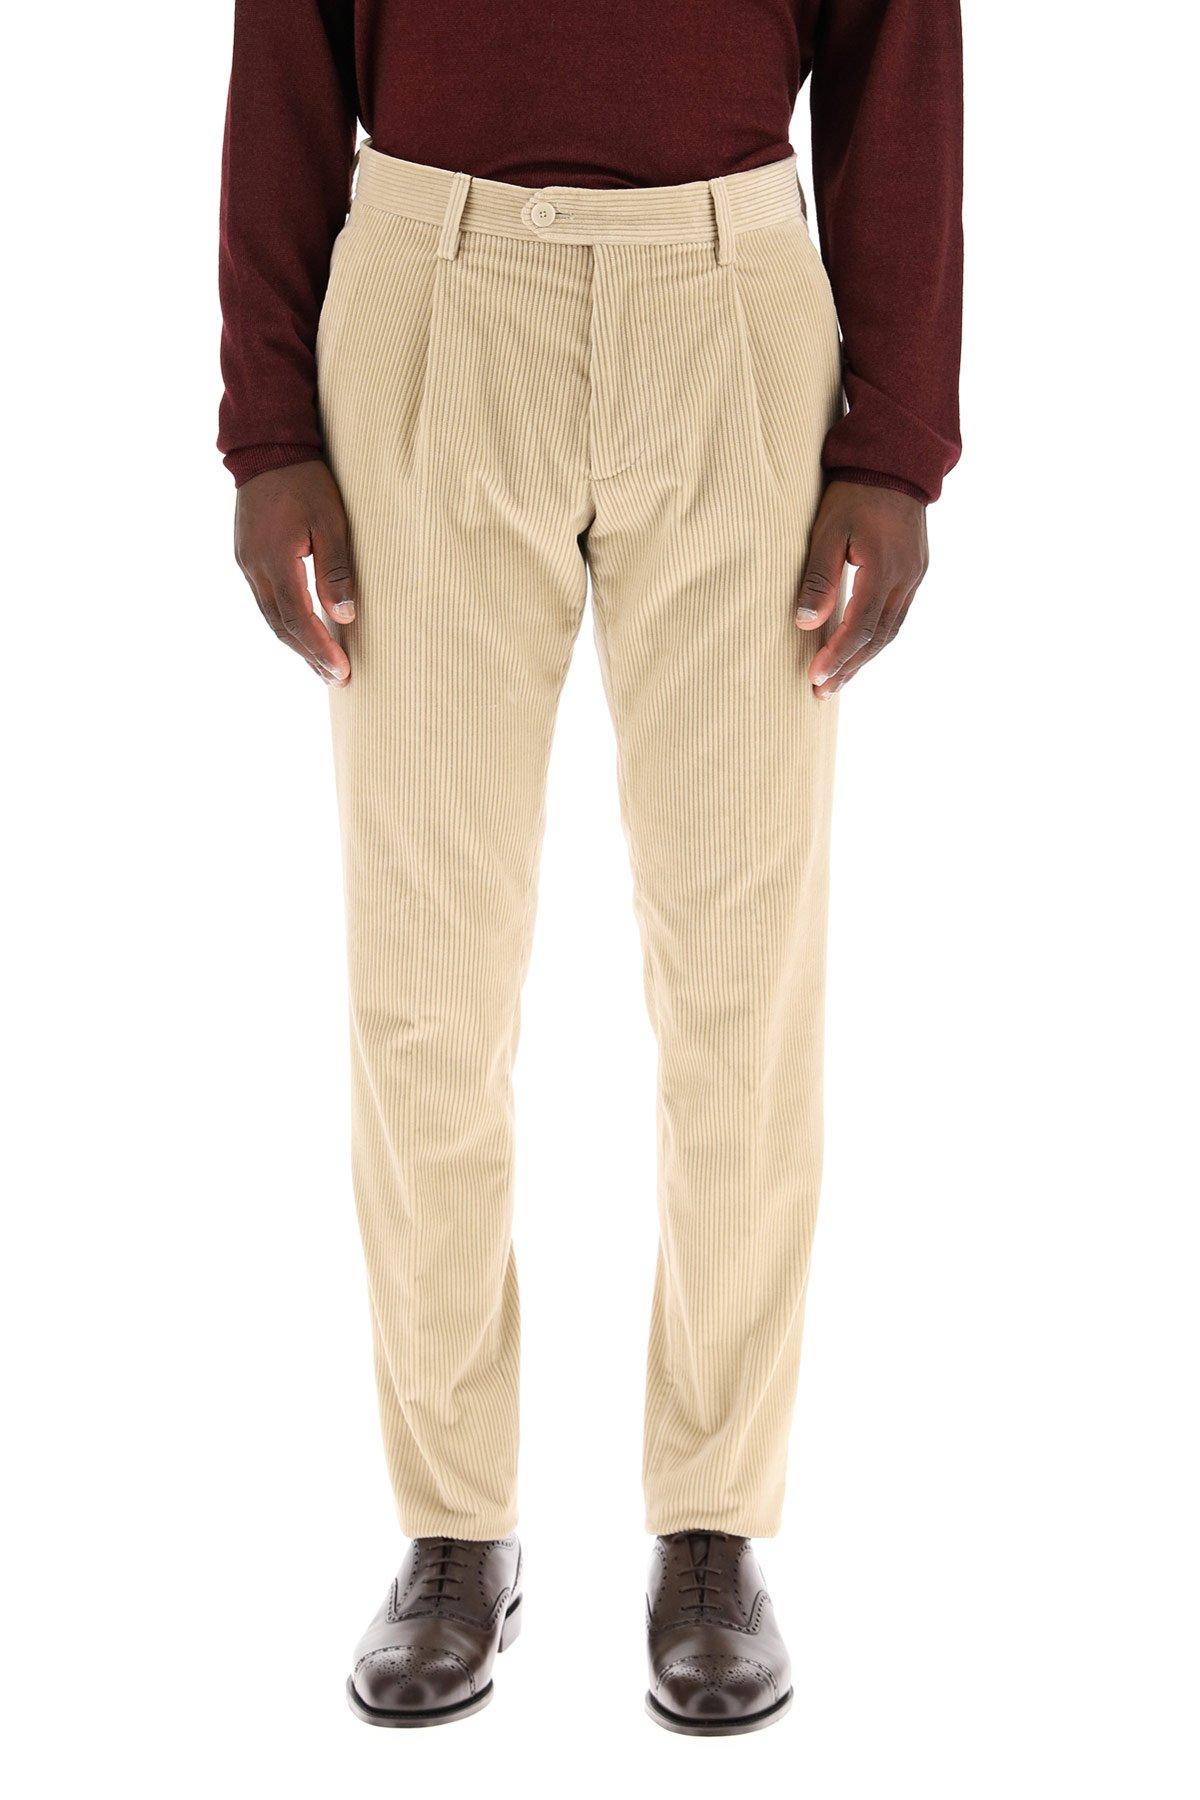 Etro pantaloni velluto